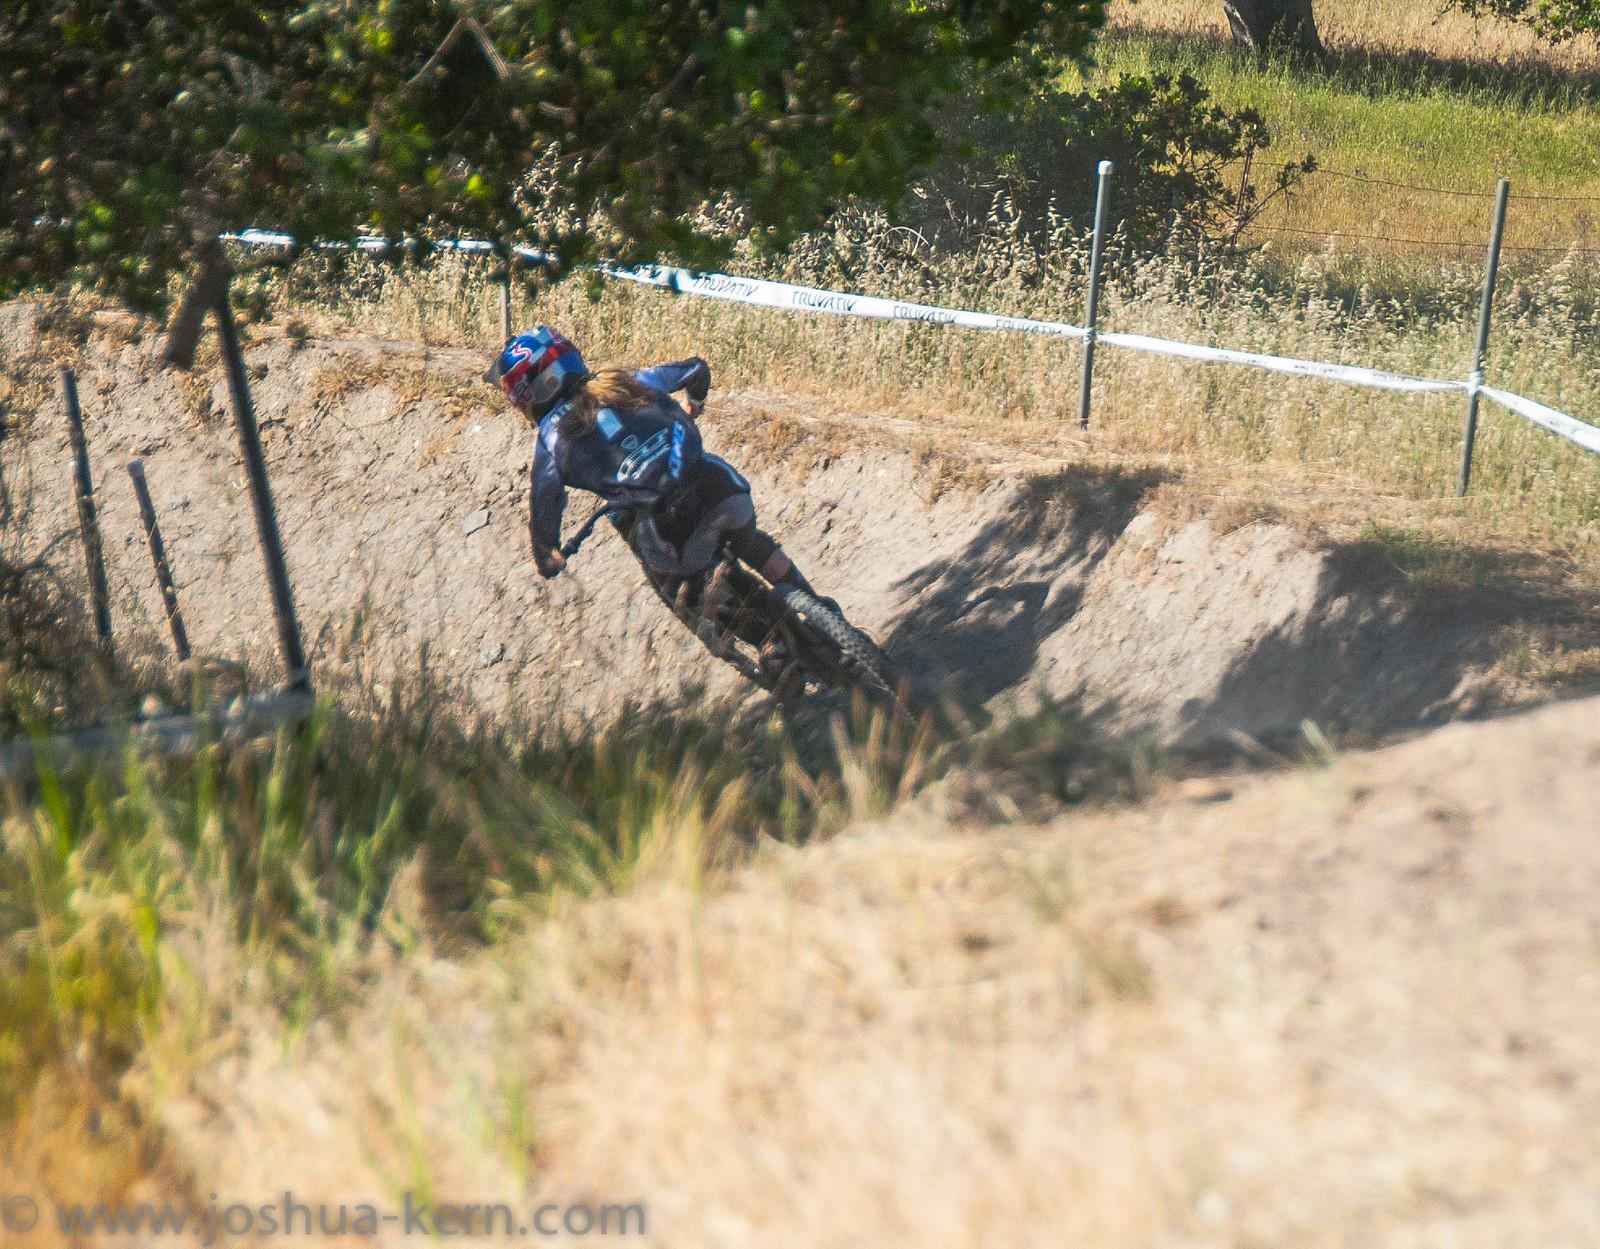 4-19-13DHPractice (13 of 36) - jkern620 - Mountain Biking Pictures - Vital MTB